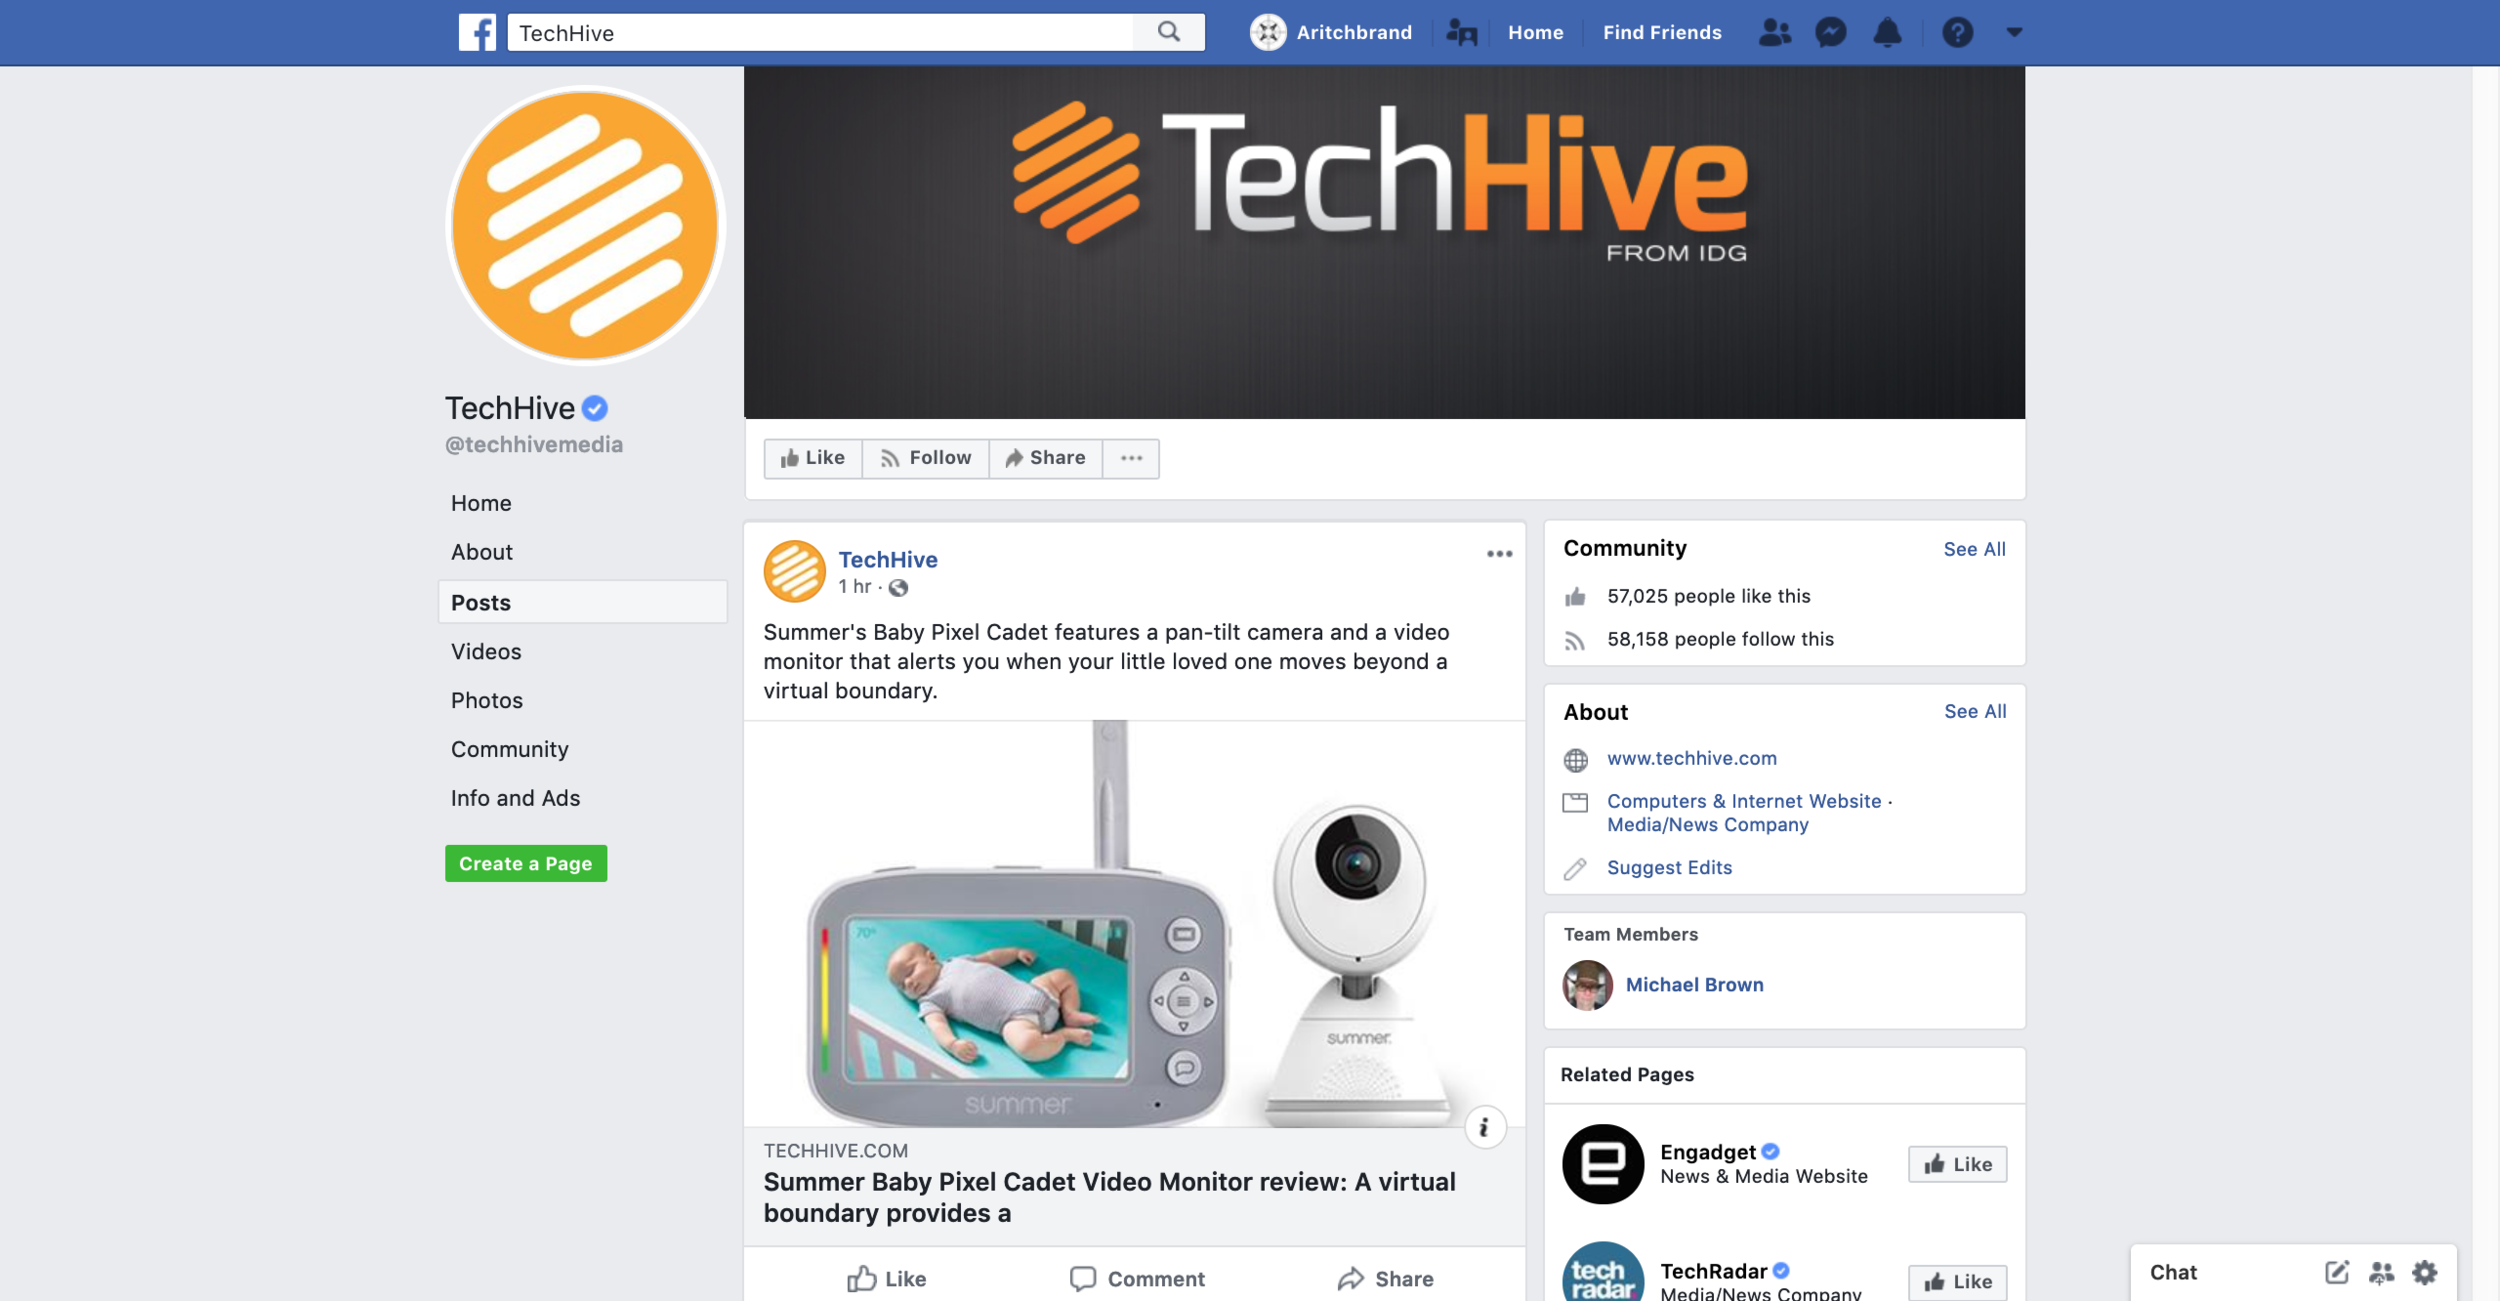 2019.03.19_TechHive, Facebook_Summer Baby Pixel Cadet Video Monitor.png